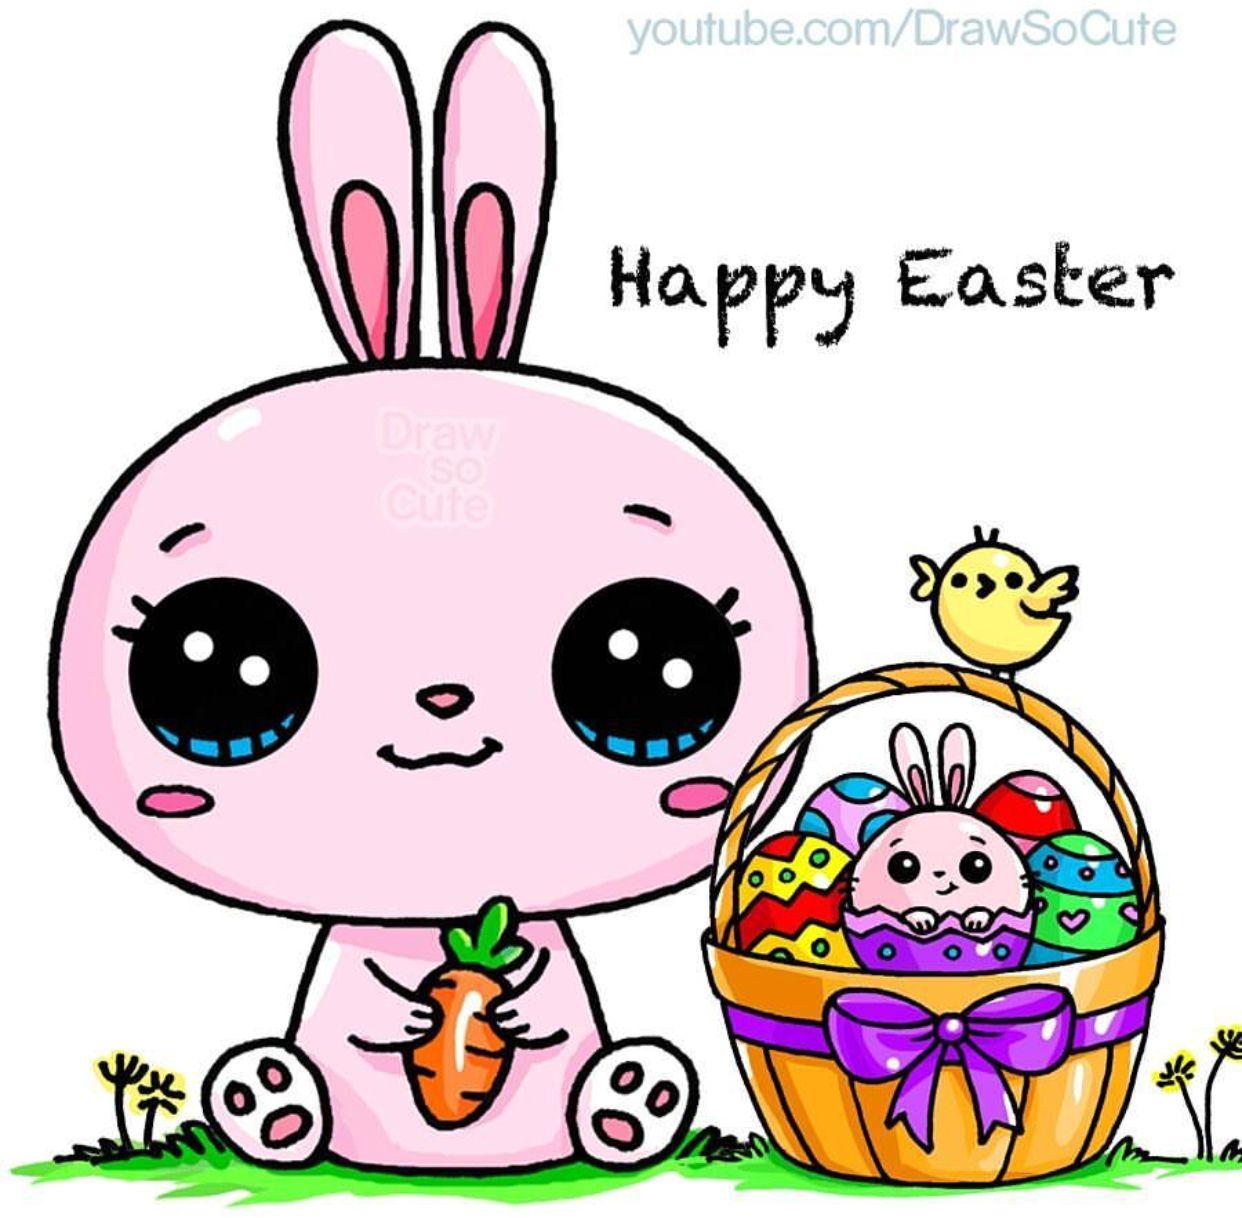 Easter Draw So Cute Kawaii Tekeningen Schattige Tekeningen Dingen Om Te Tekenen